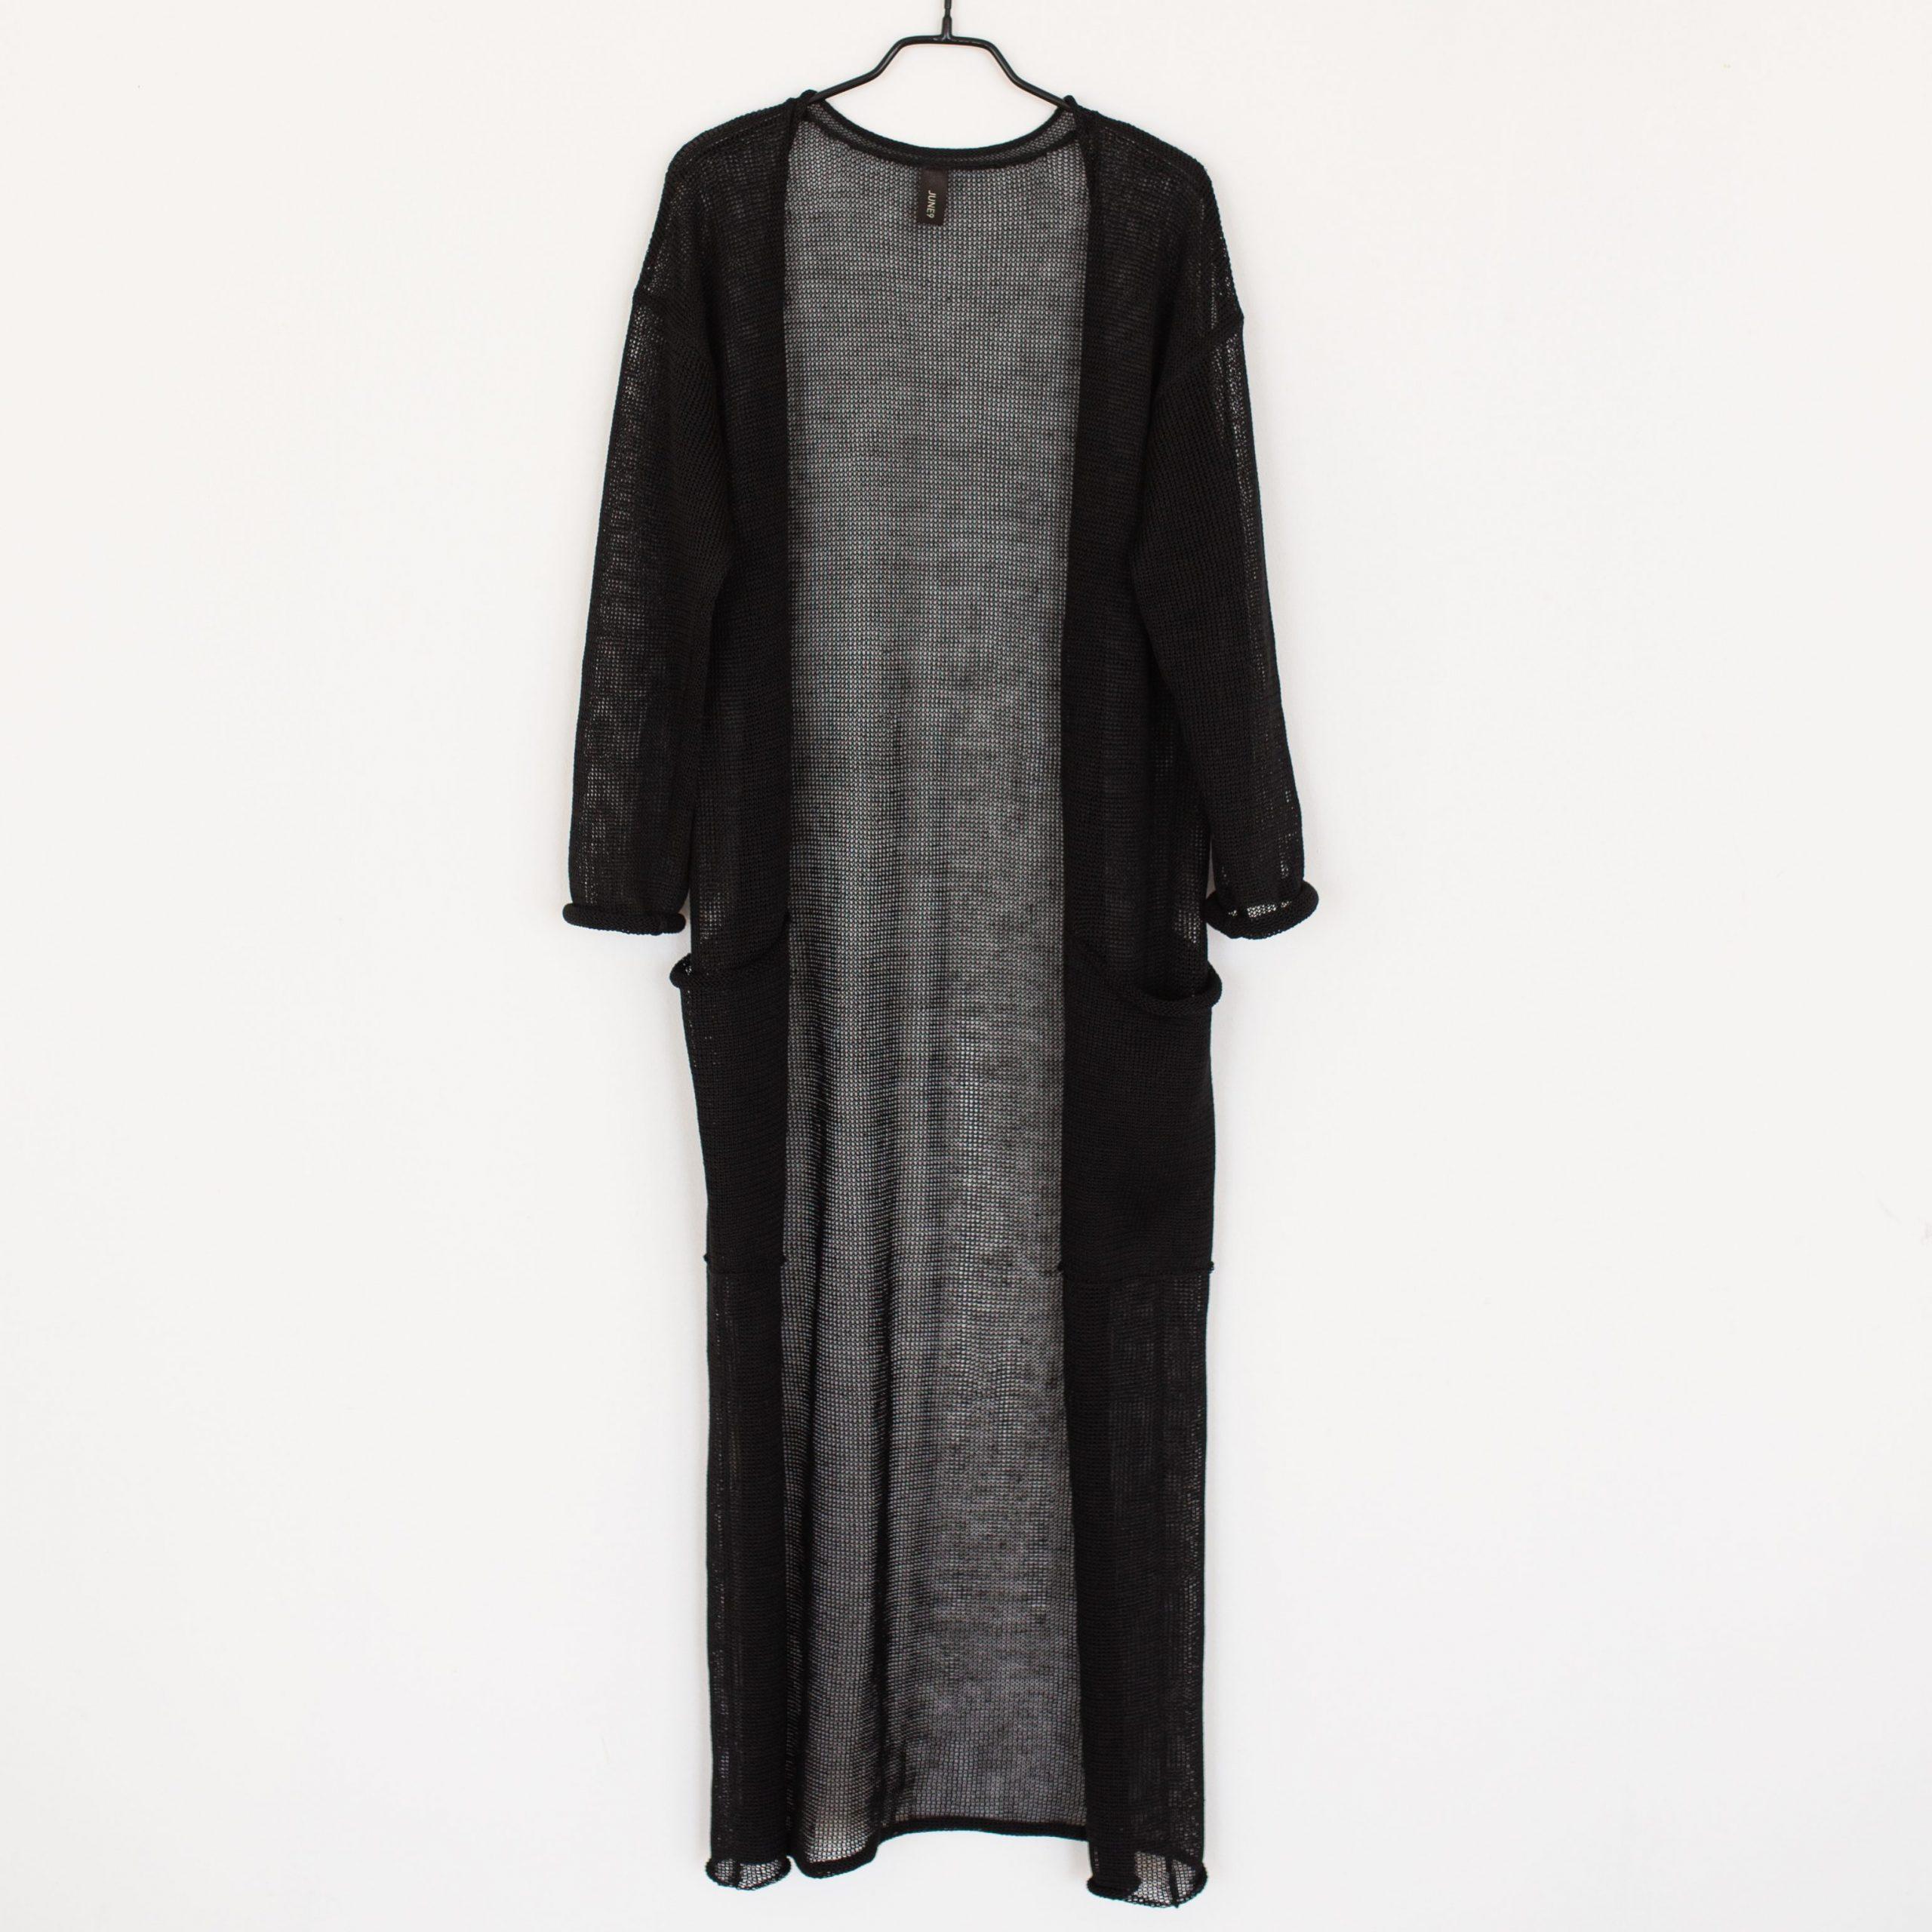 Black linen jacket by June9concept